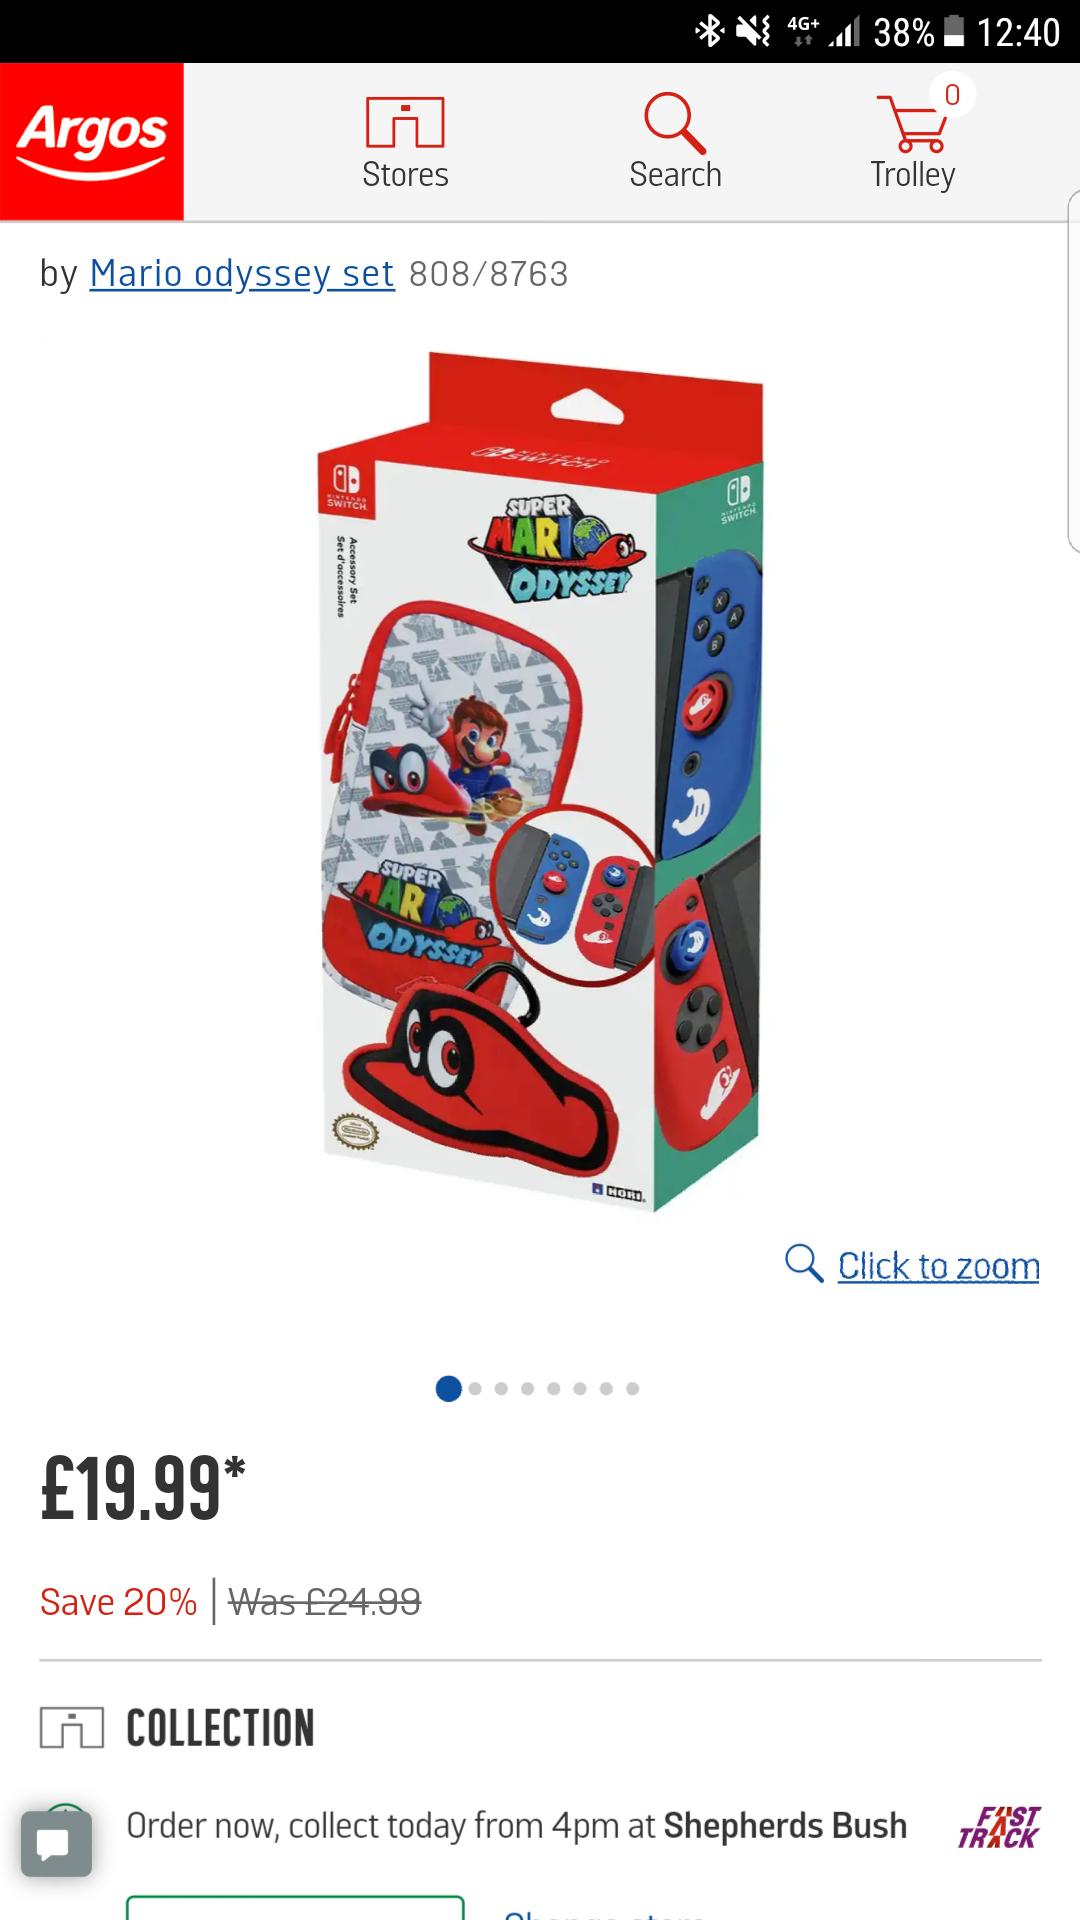 £5 off Super mario odyssey accessory set £19.99 at Argos